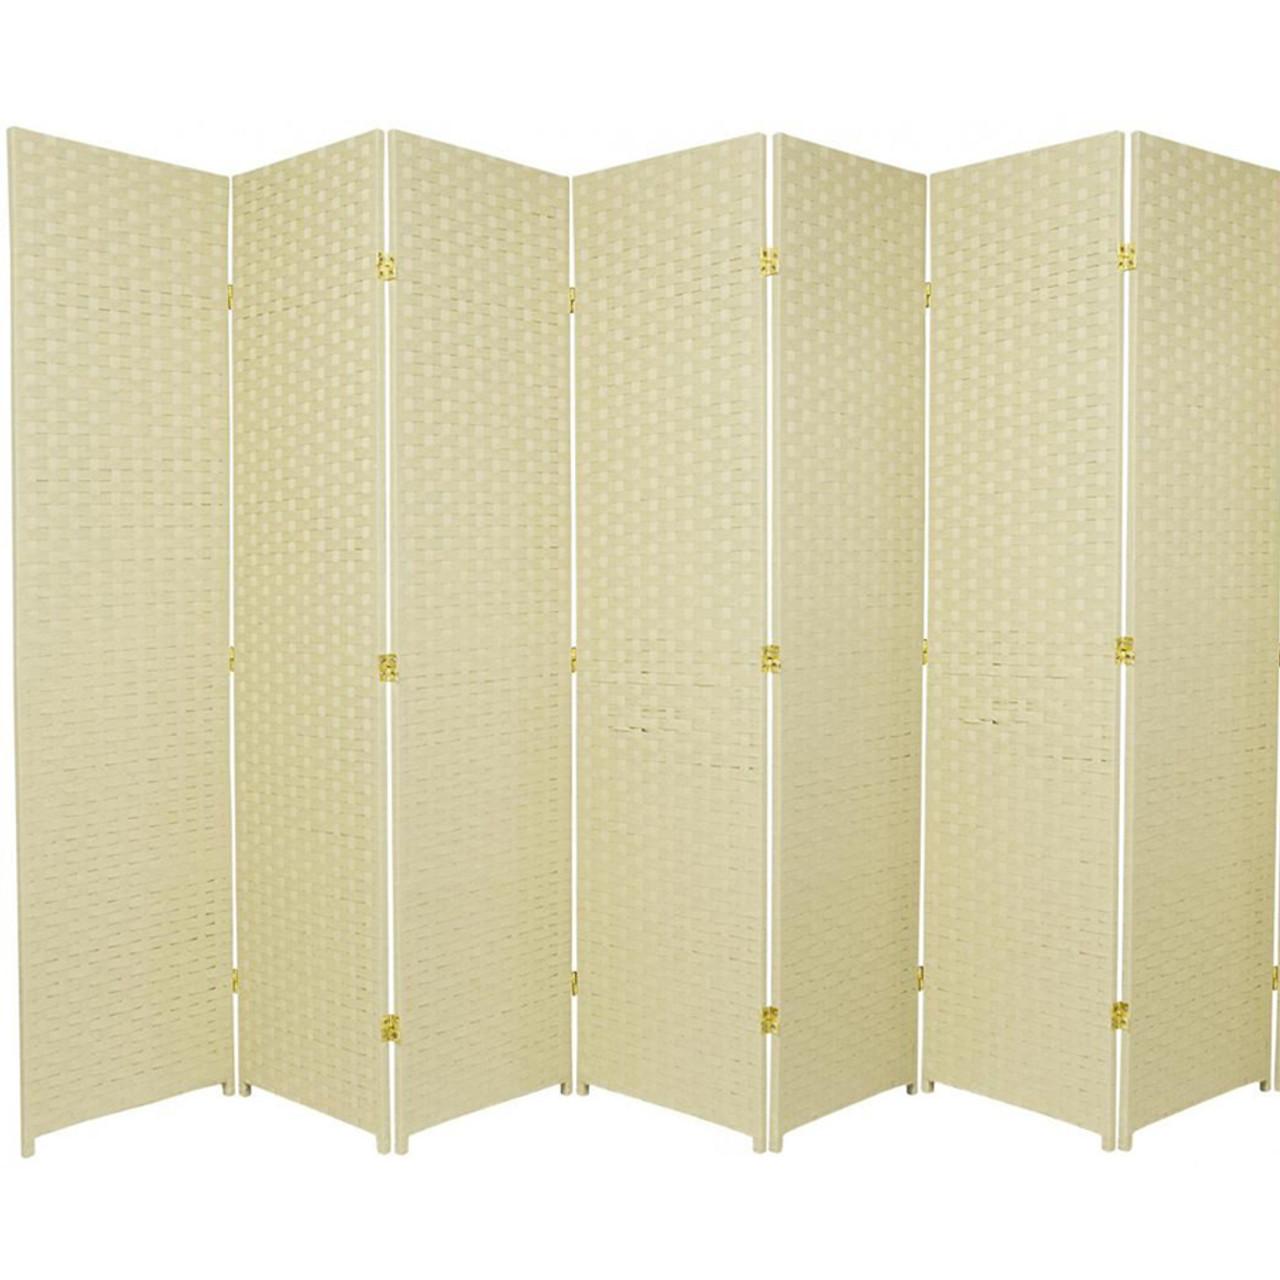 Bamboo Woven Panel Room Divider, Privacy Partition Screen, 7 Panels in USA, California, New York, NY City, Los Angeles, San Francisco, Pennsylvania, Washington DC, Virginia, MD